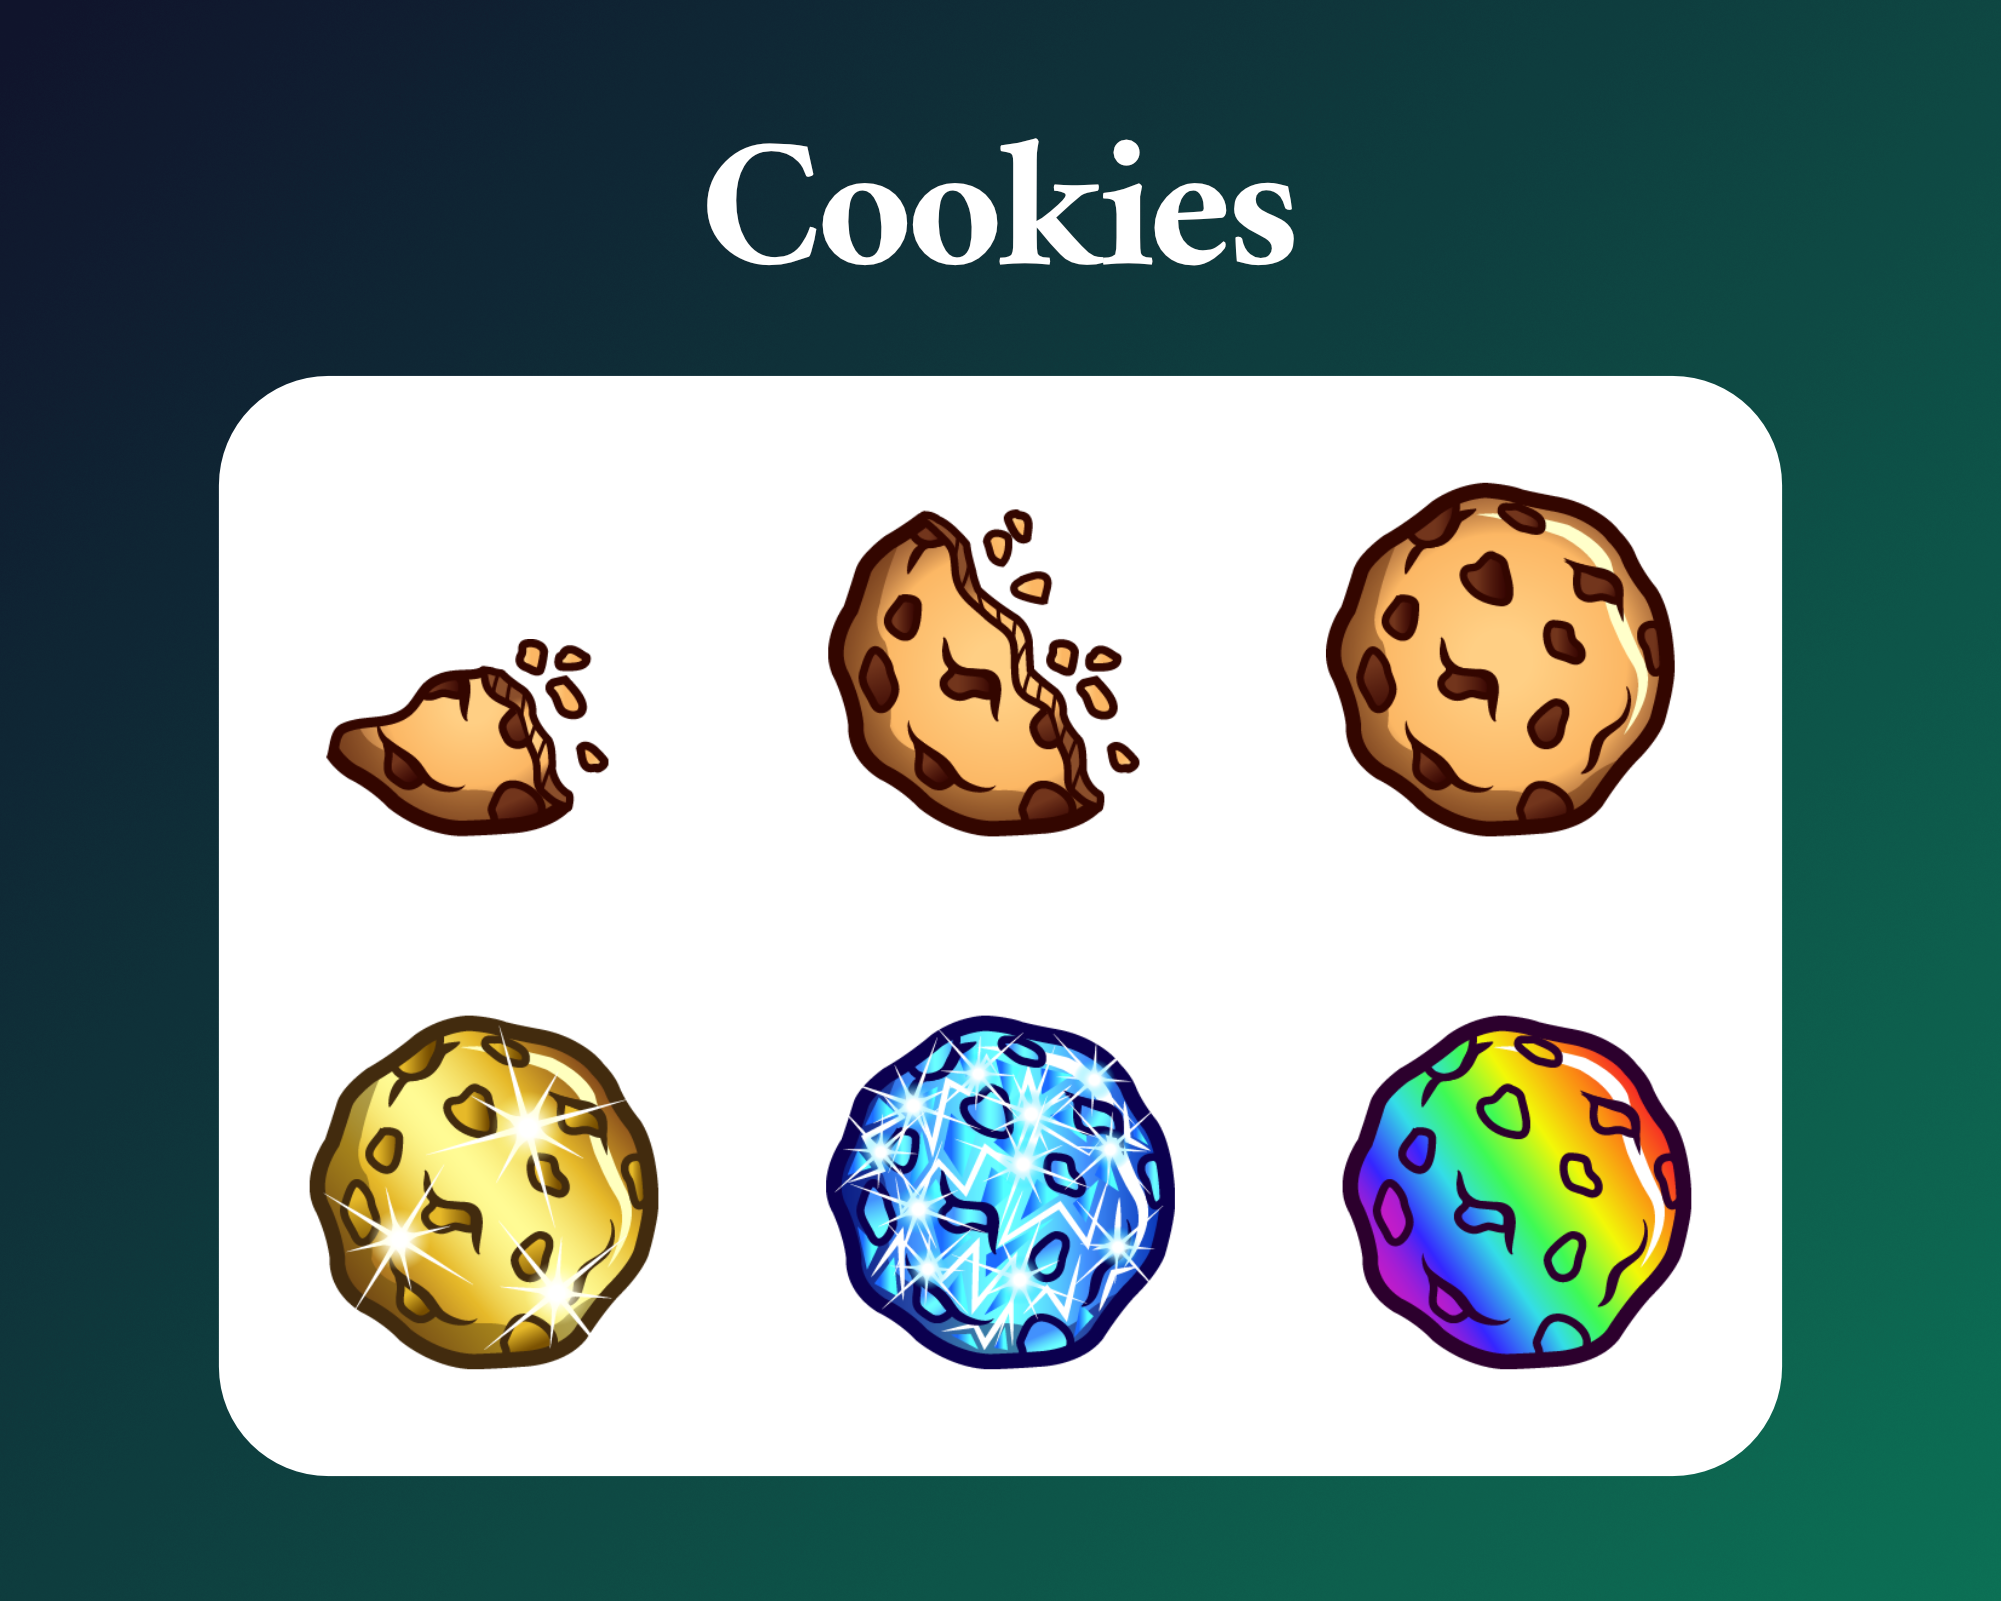 Free sub badges as cookies